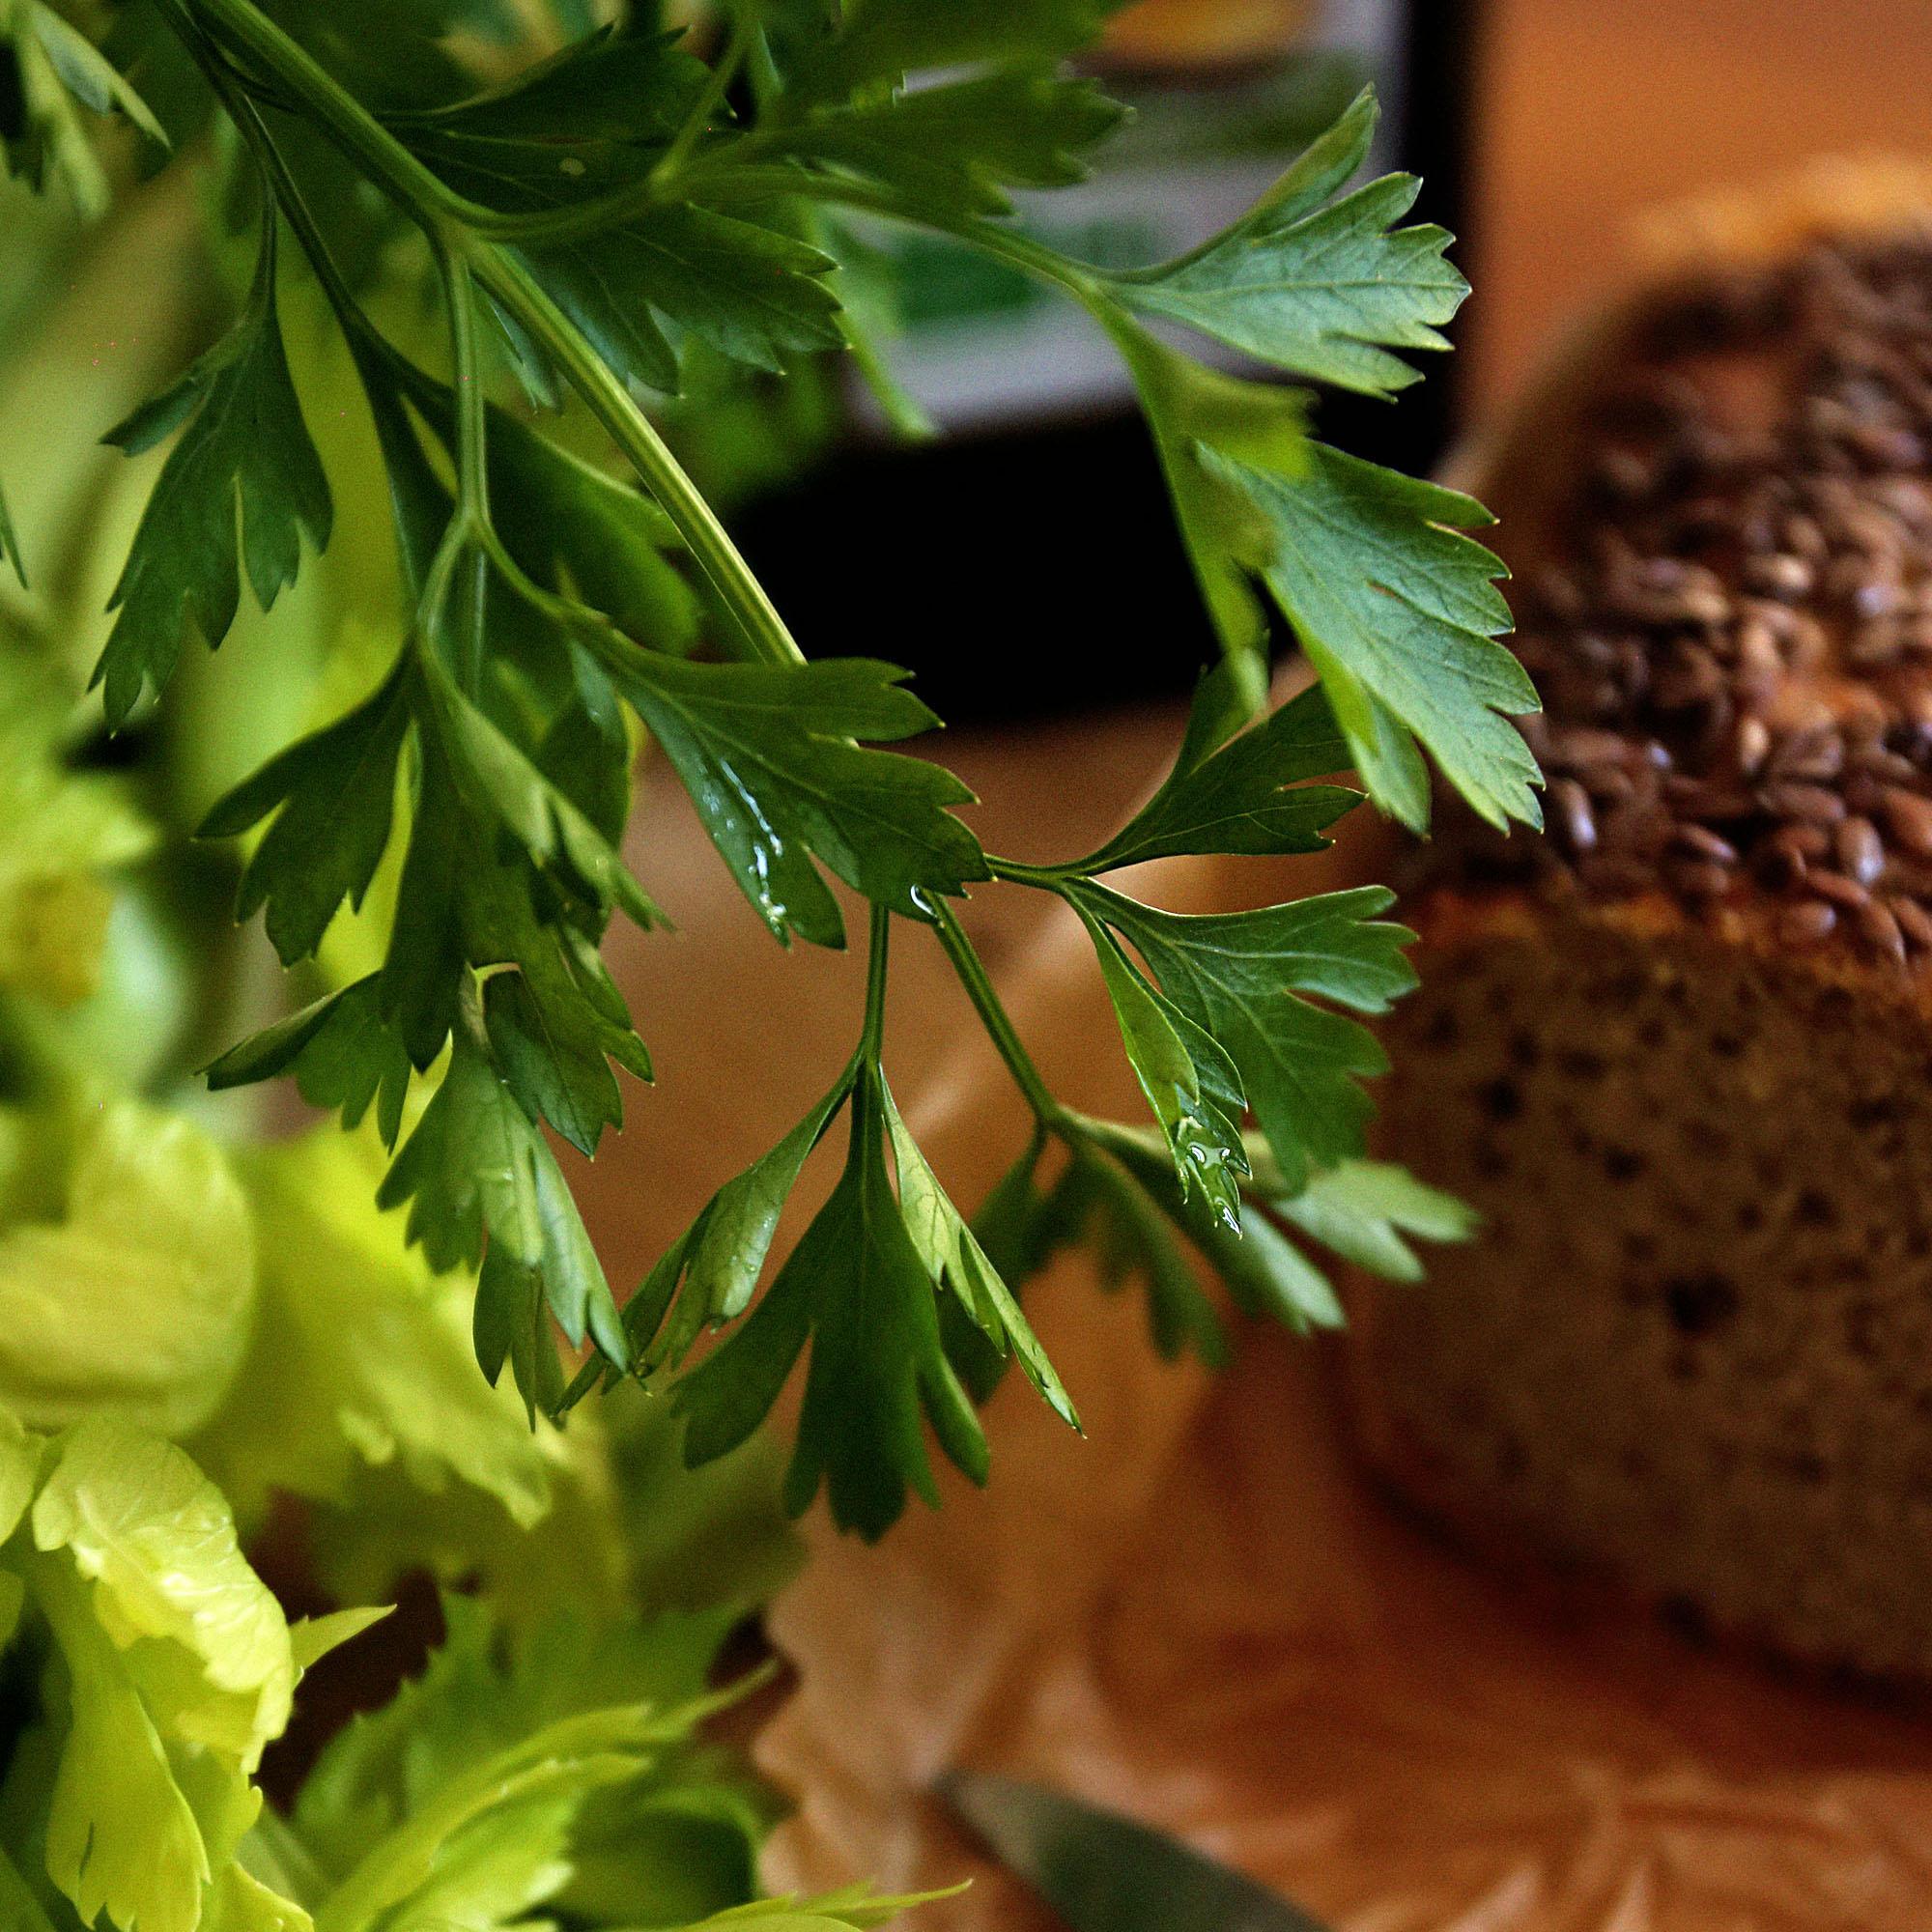 Lady-biche-blog-recette-celeri-13